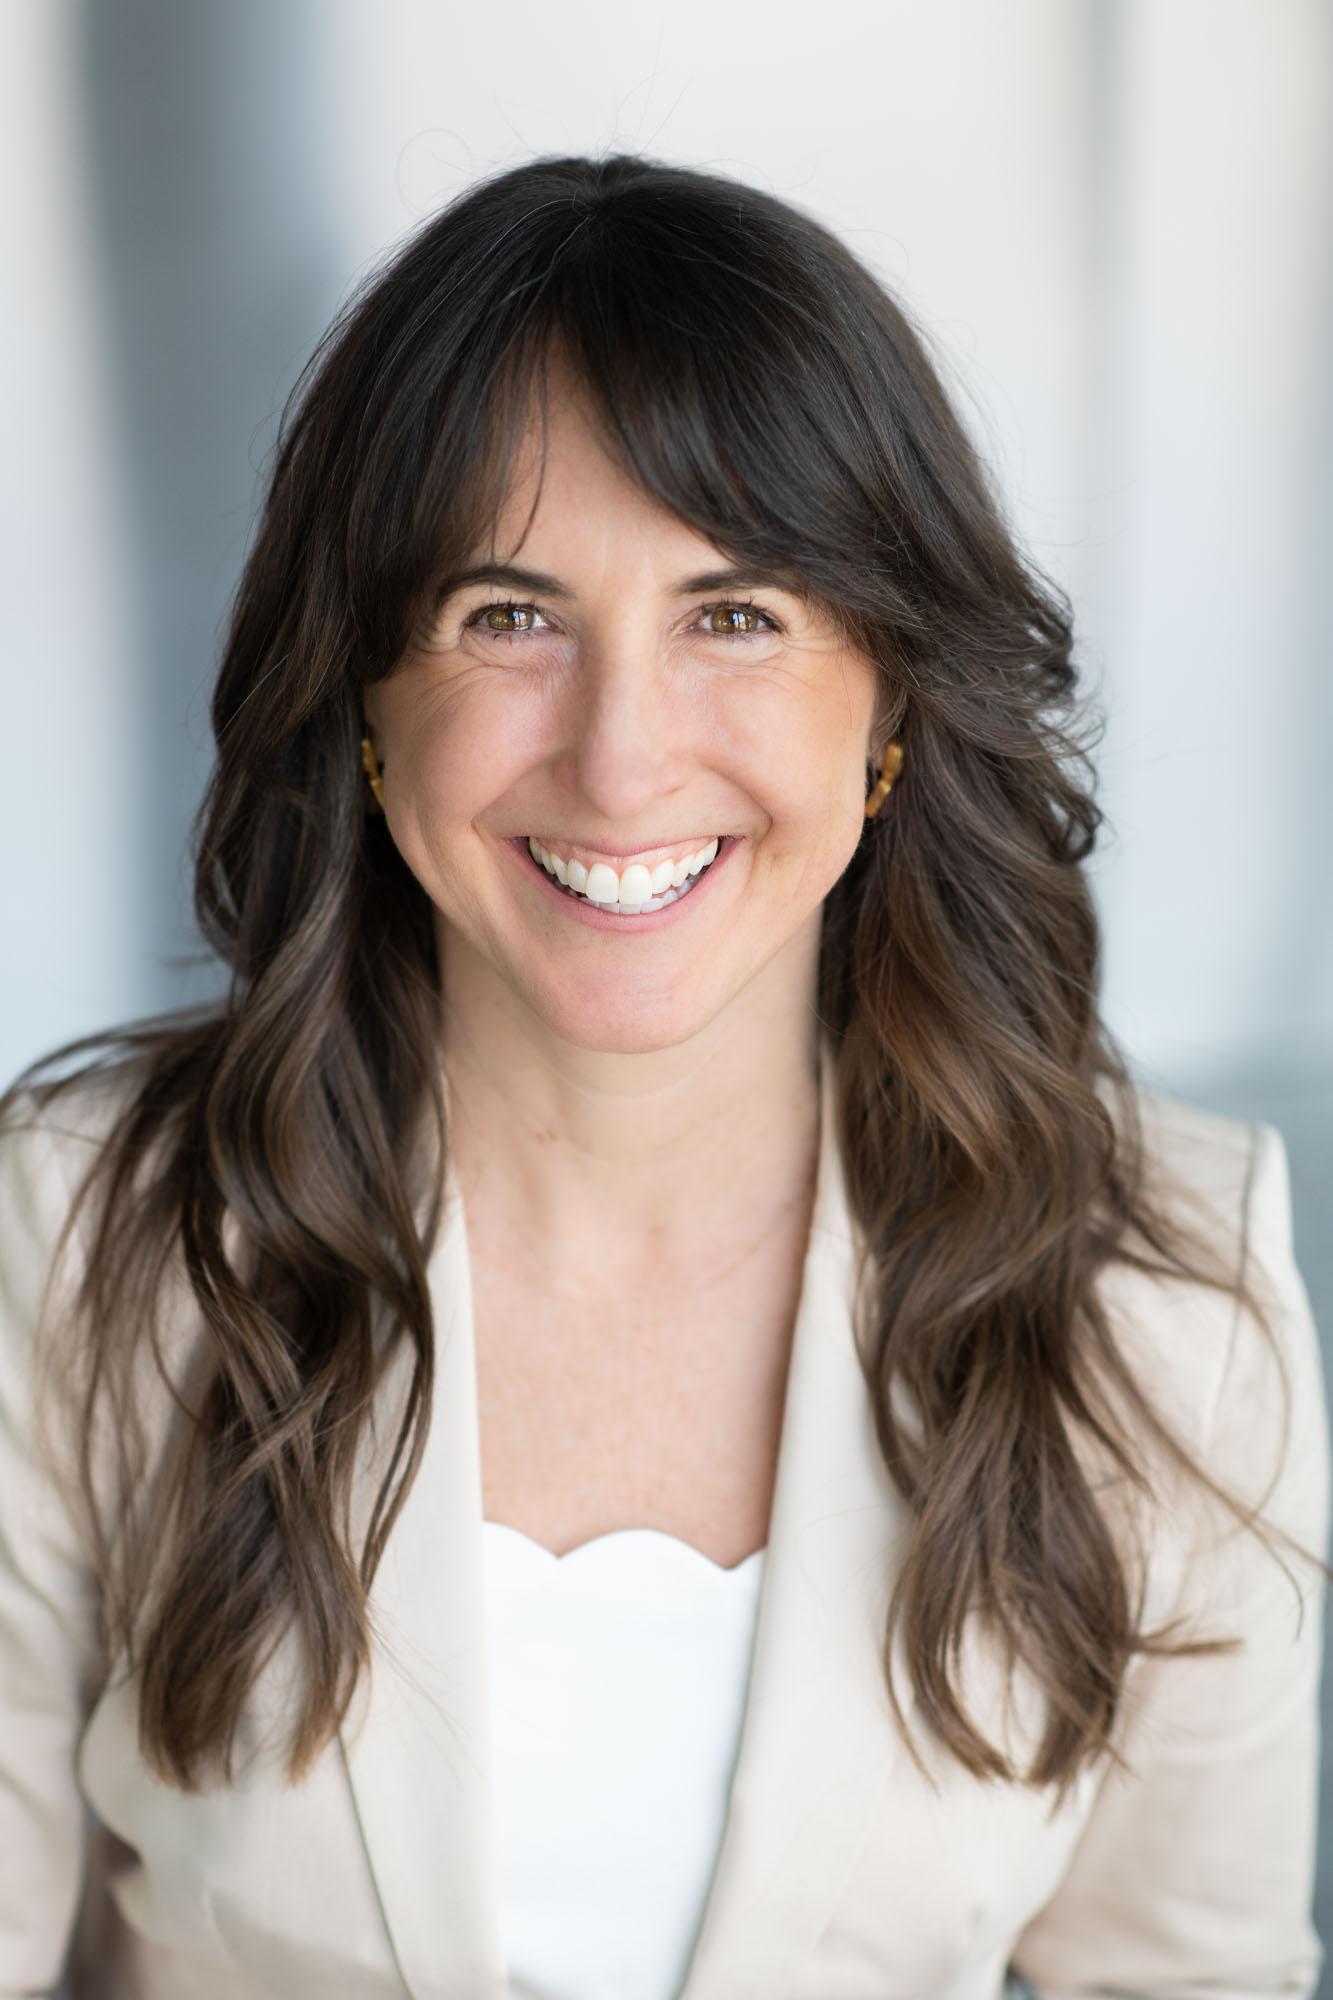 Image of Elizabeth Adams, PhD, LP, ABPP-CN, Neuropsychologist